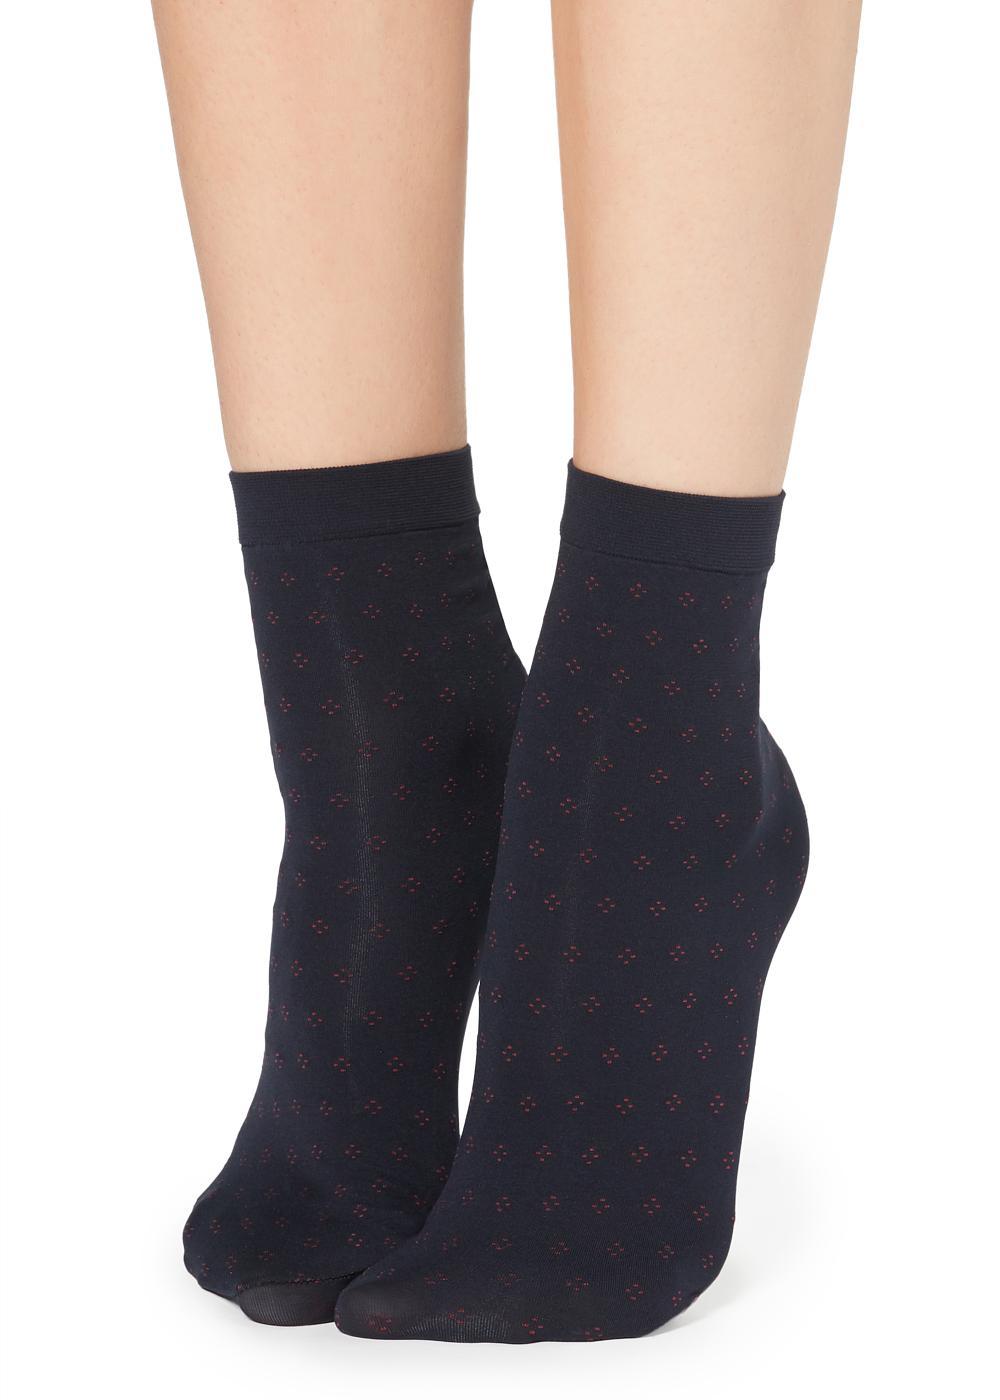 Classic patterned socks